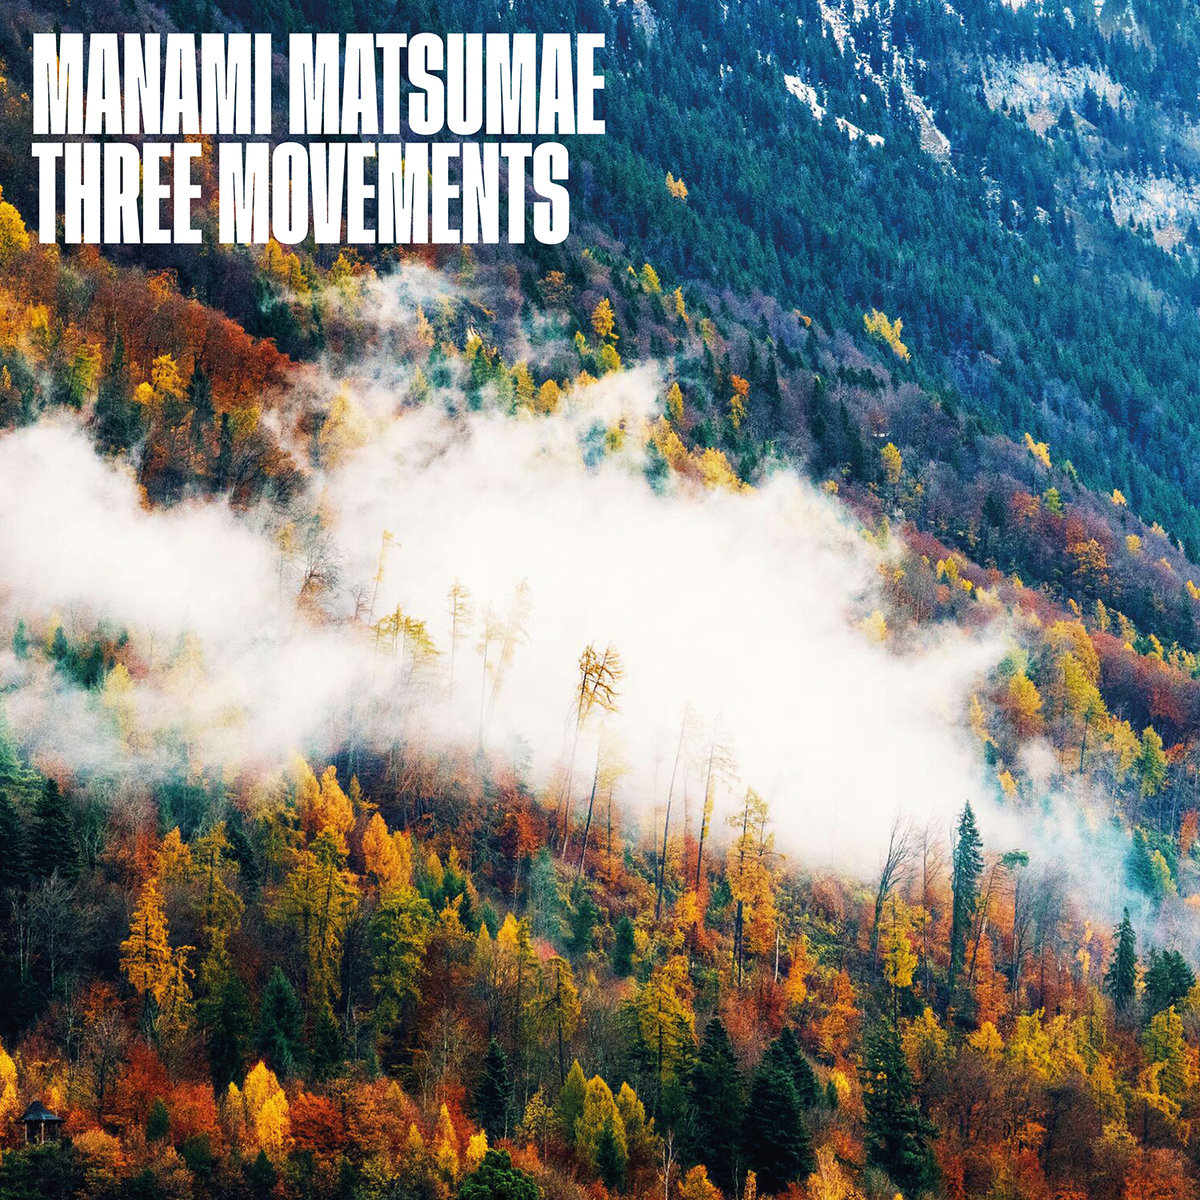 BW-024  Three Movements 松前真奈美の初ソロアルバム 配信・CD・アナログレコード盤